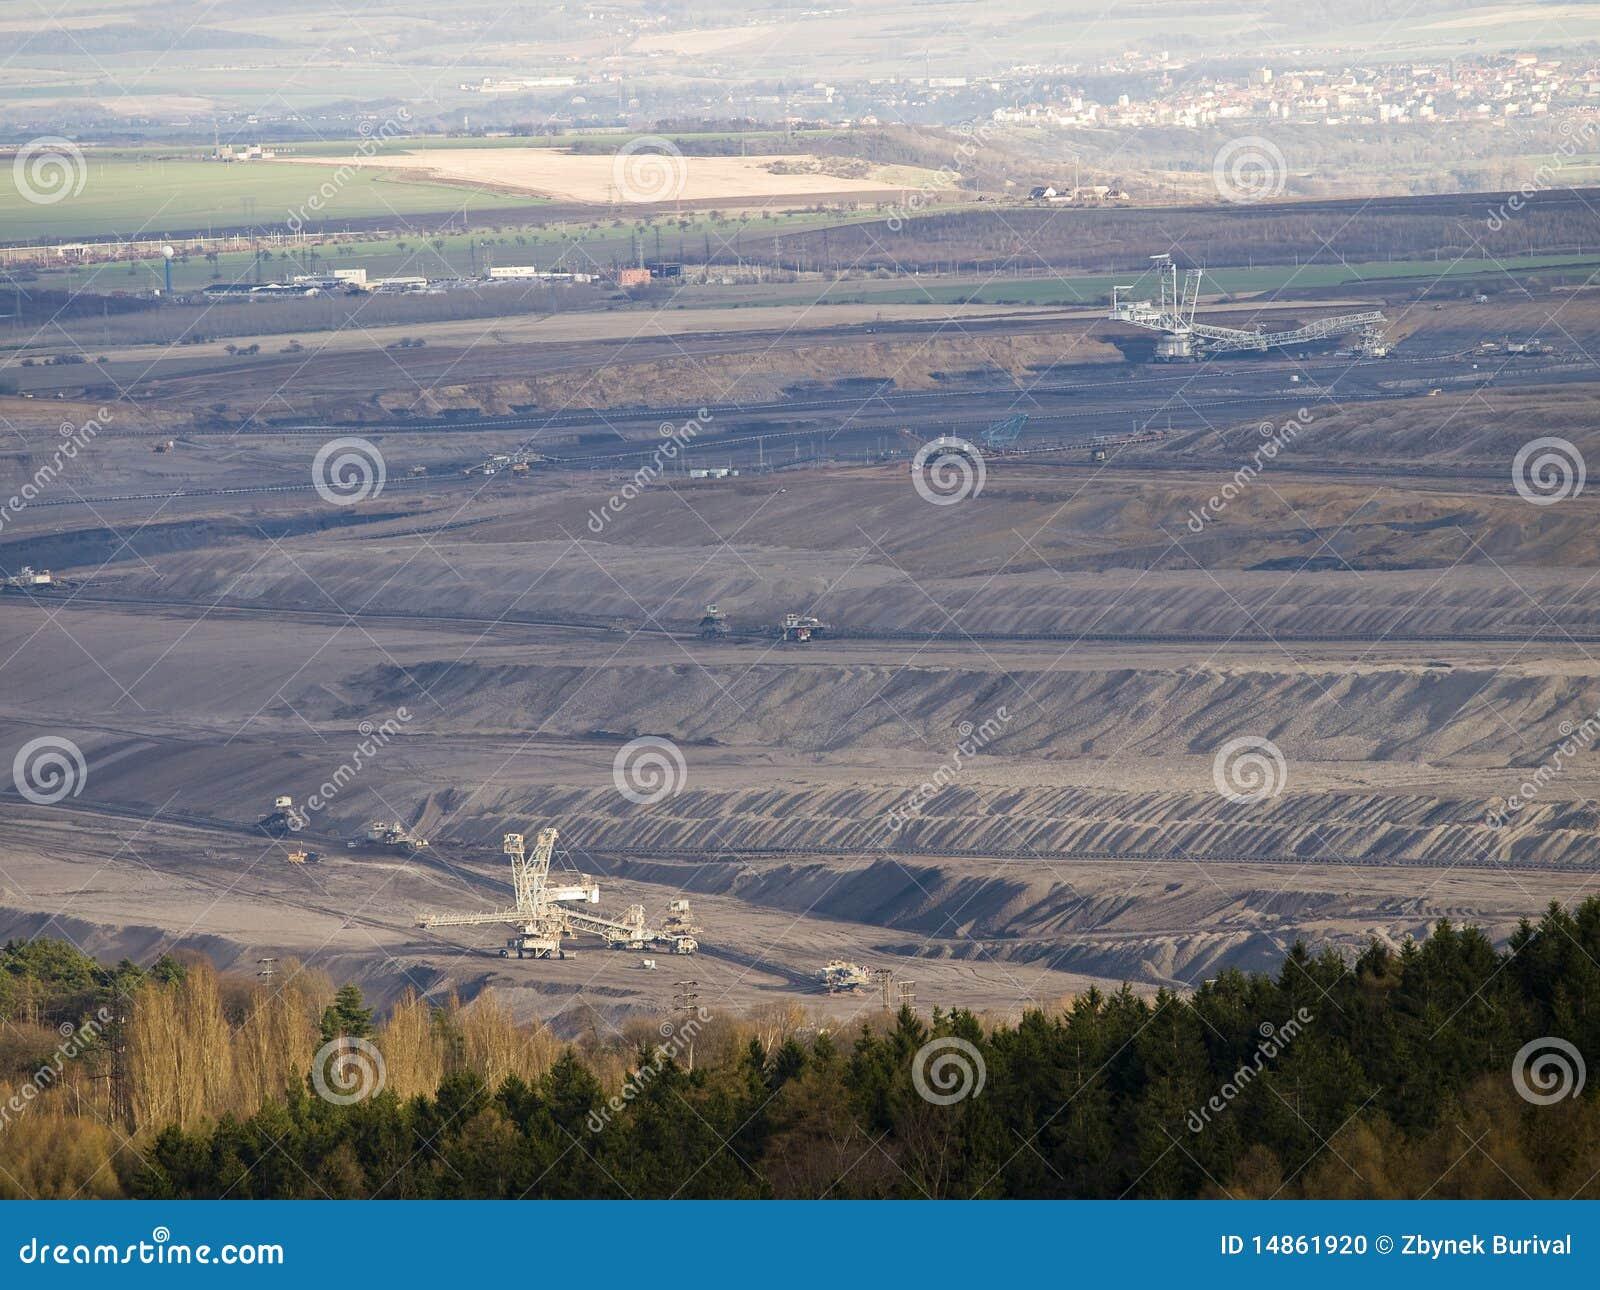 Open pit coal mining